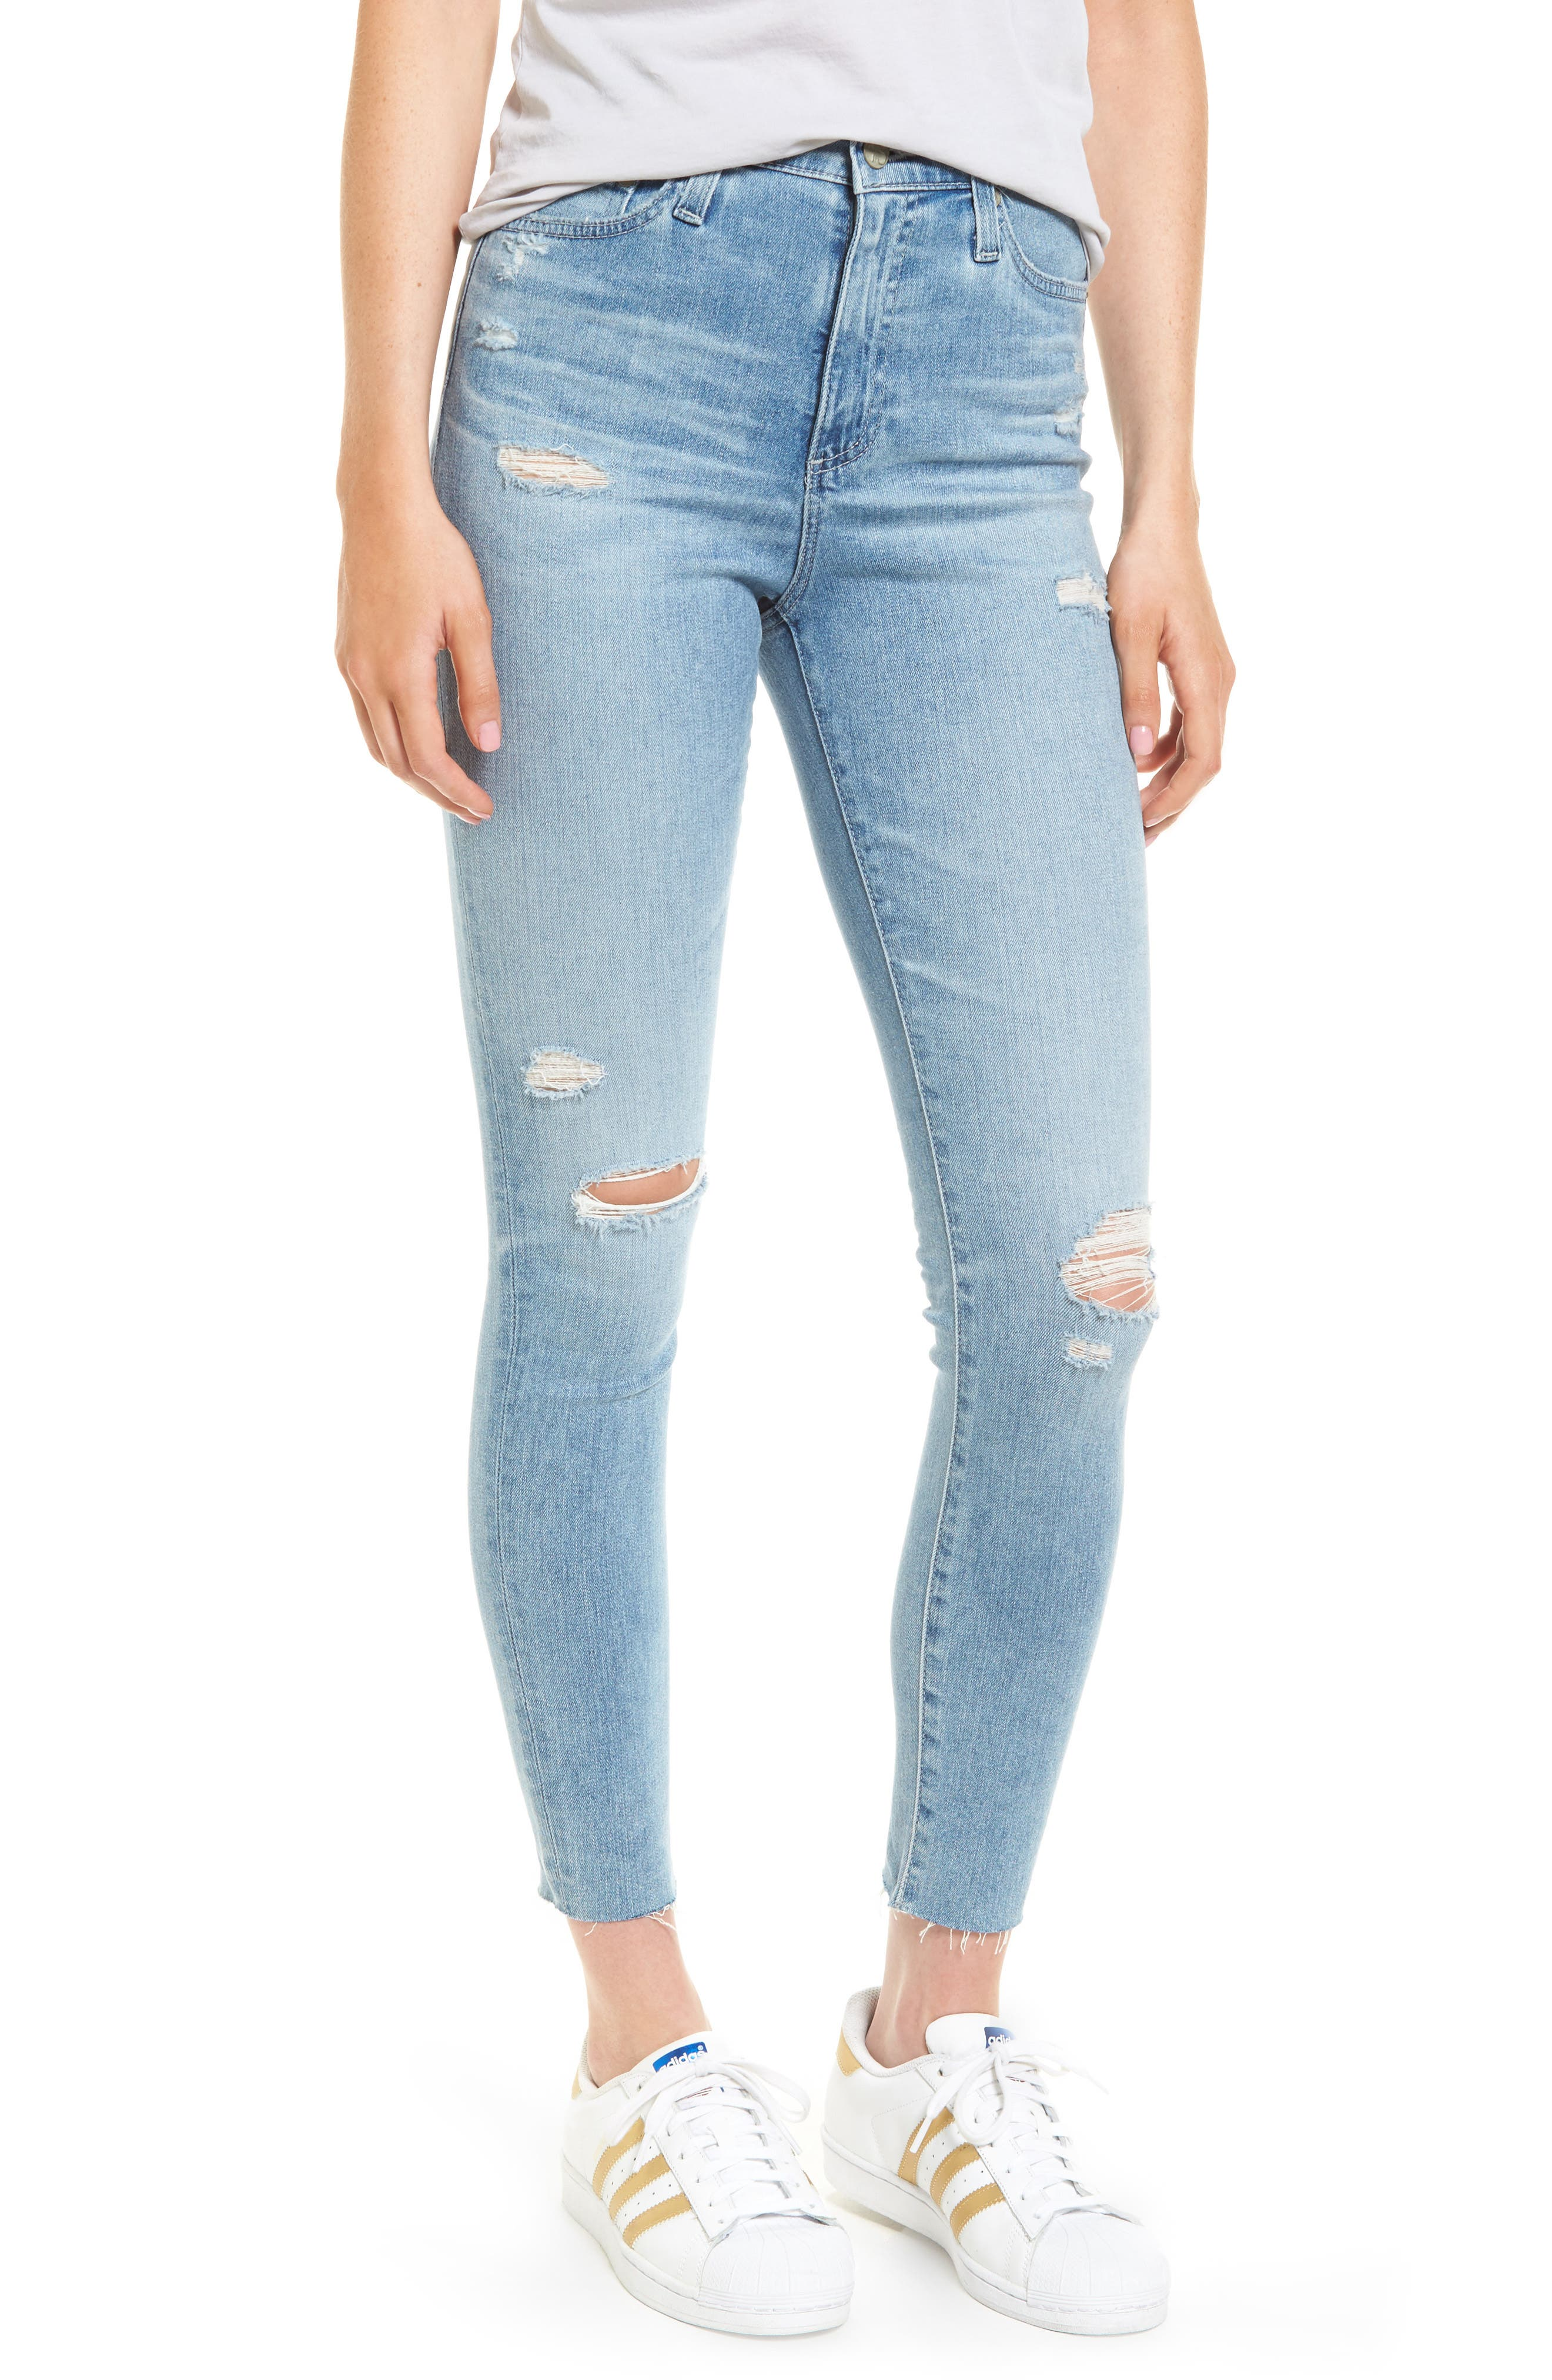 Mila High Waist Ankle Skinny Jeans,                             Main thumbnail 1, color,                             426